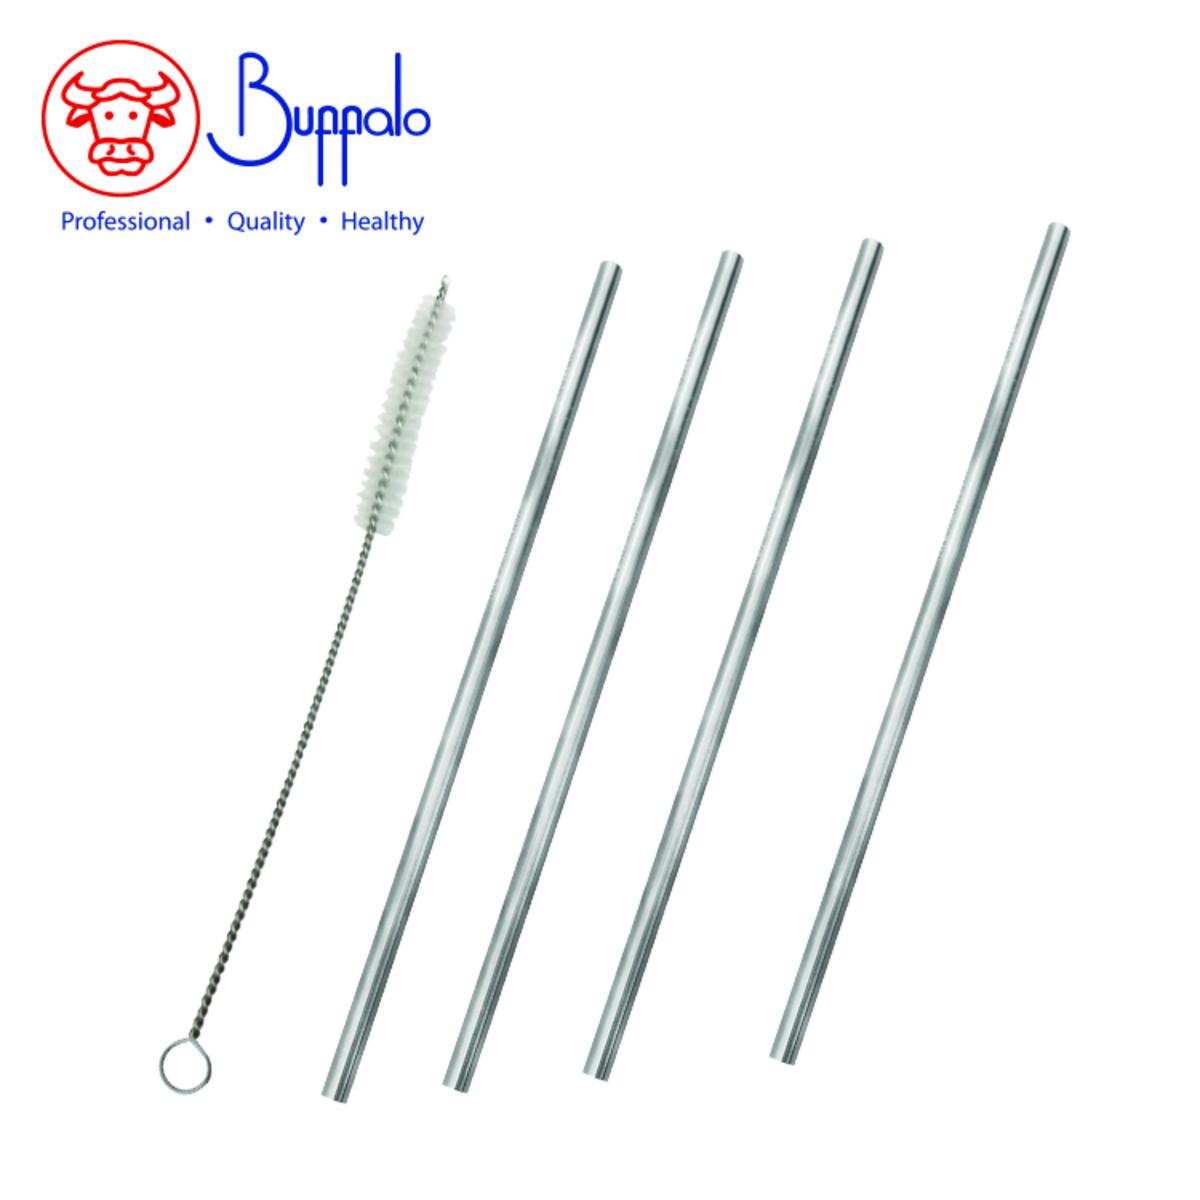 18/8 Stainless Steel Straight Straws 4PCS (BFS001-04)